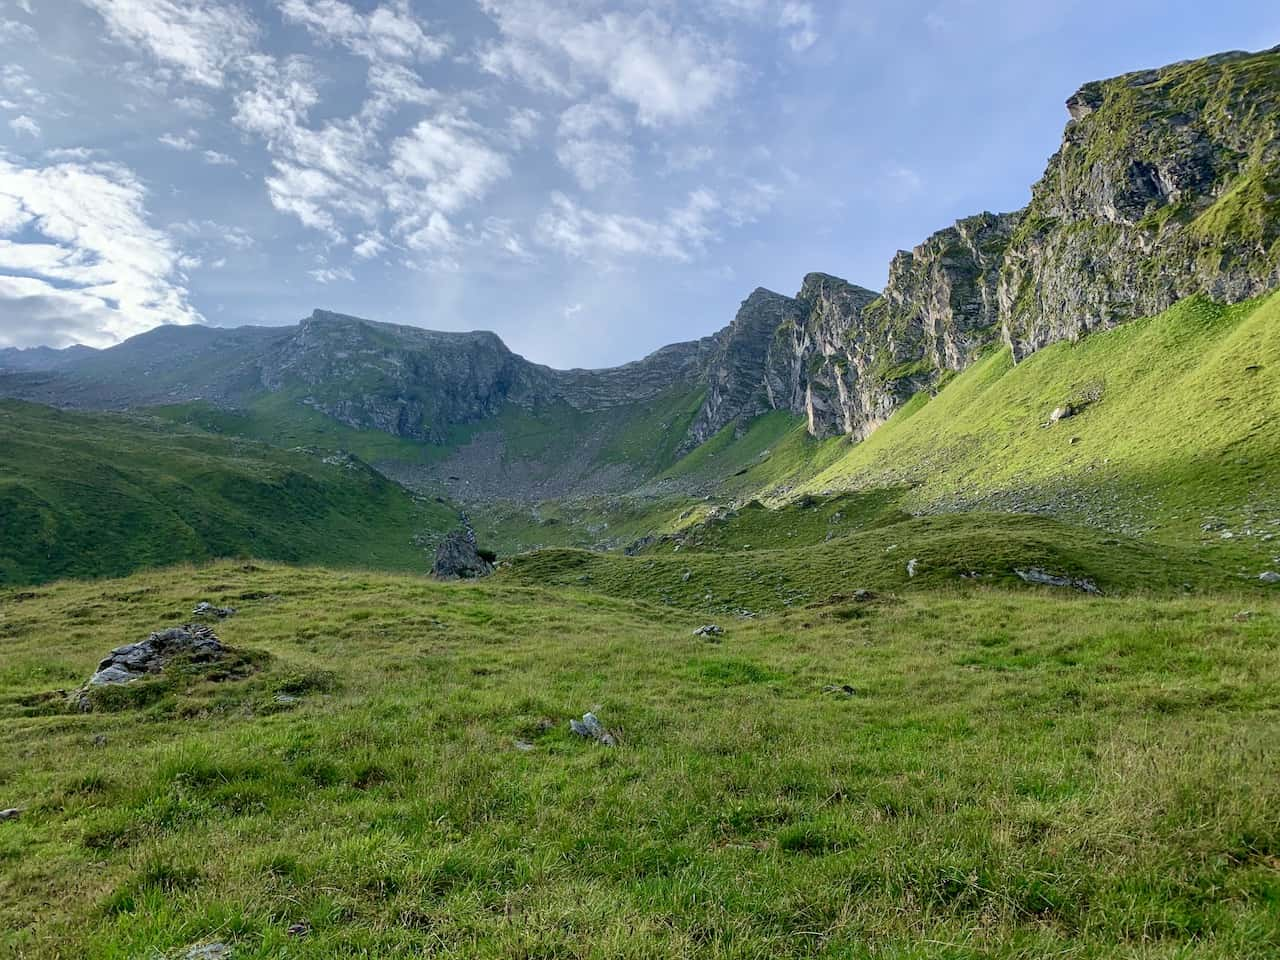 Ahorn Mountain Edelhutte Route